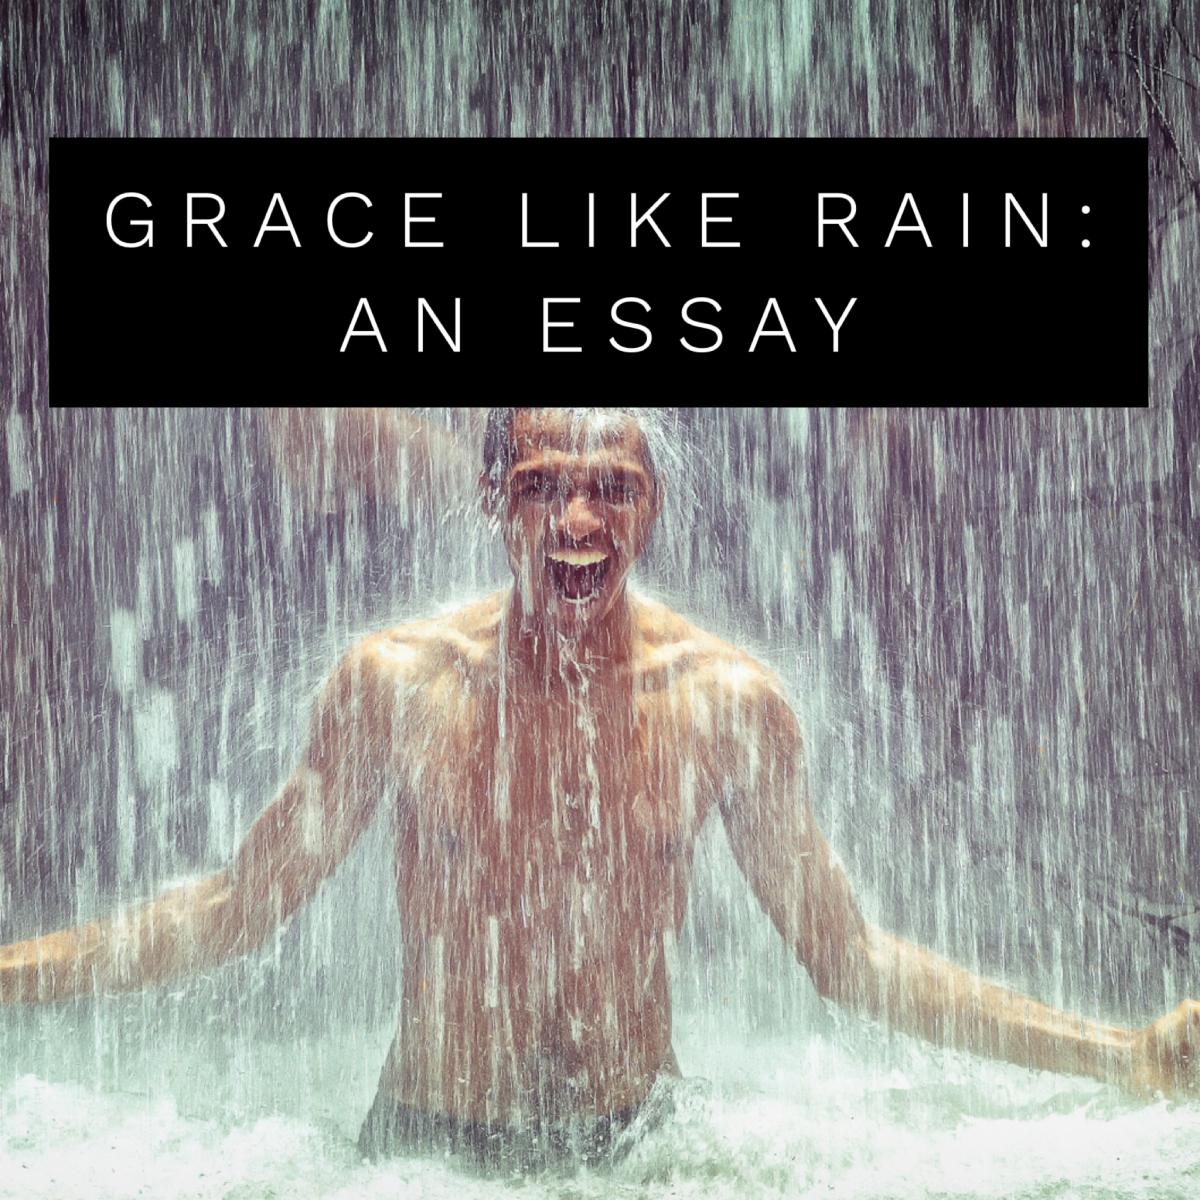 Grace Like Rain: An Essay